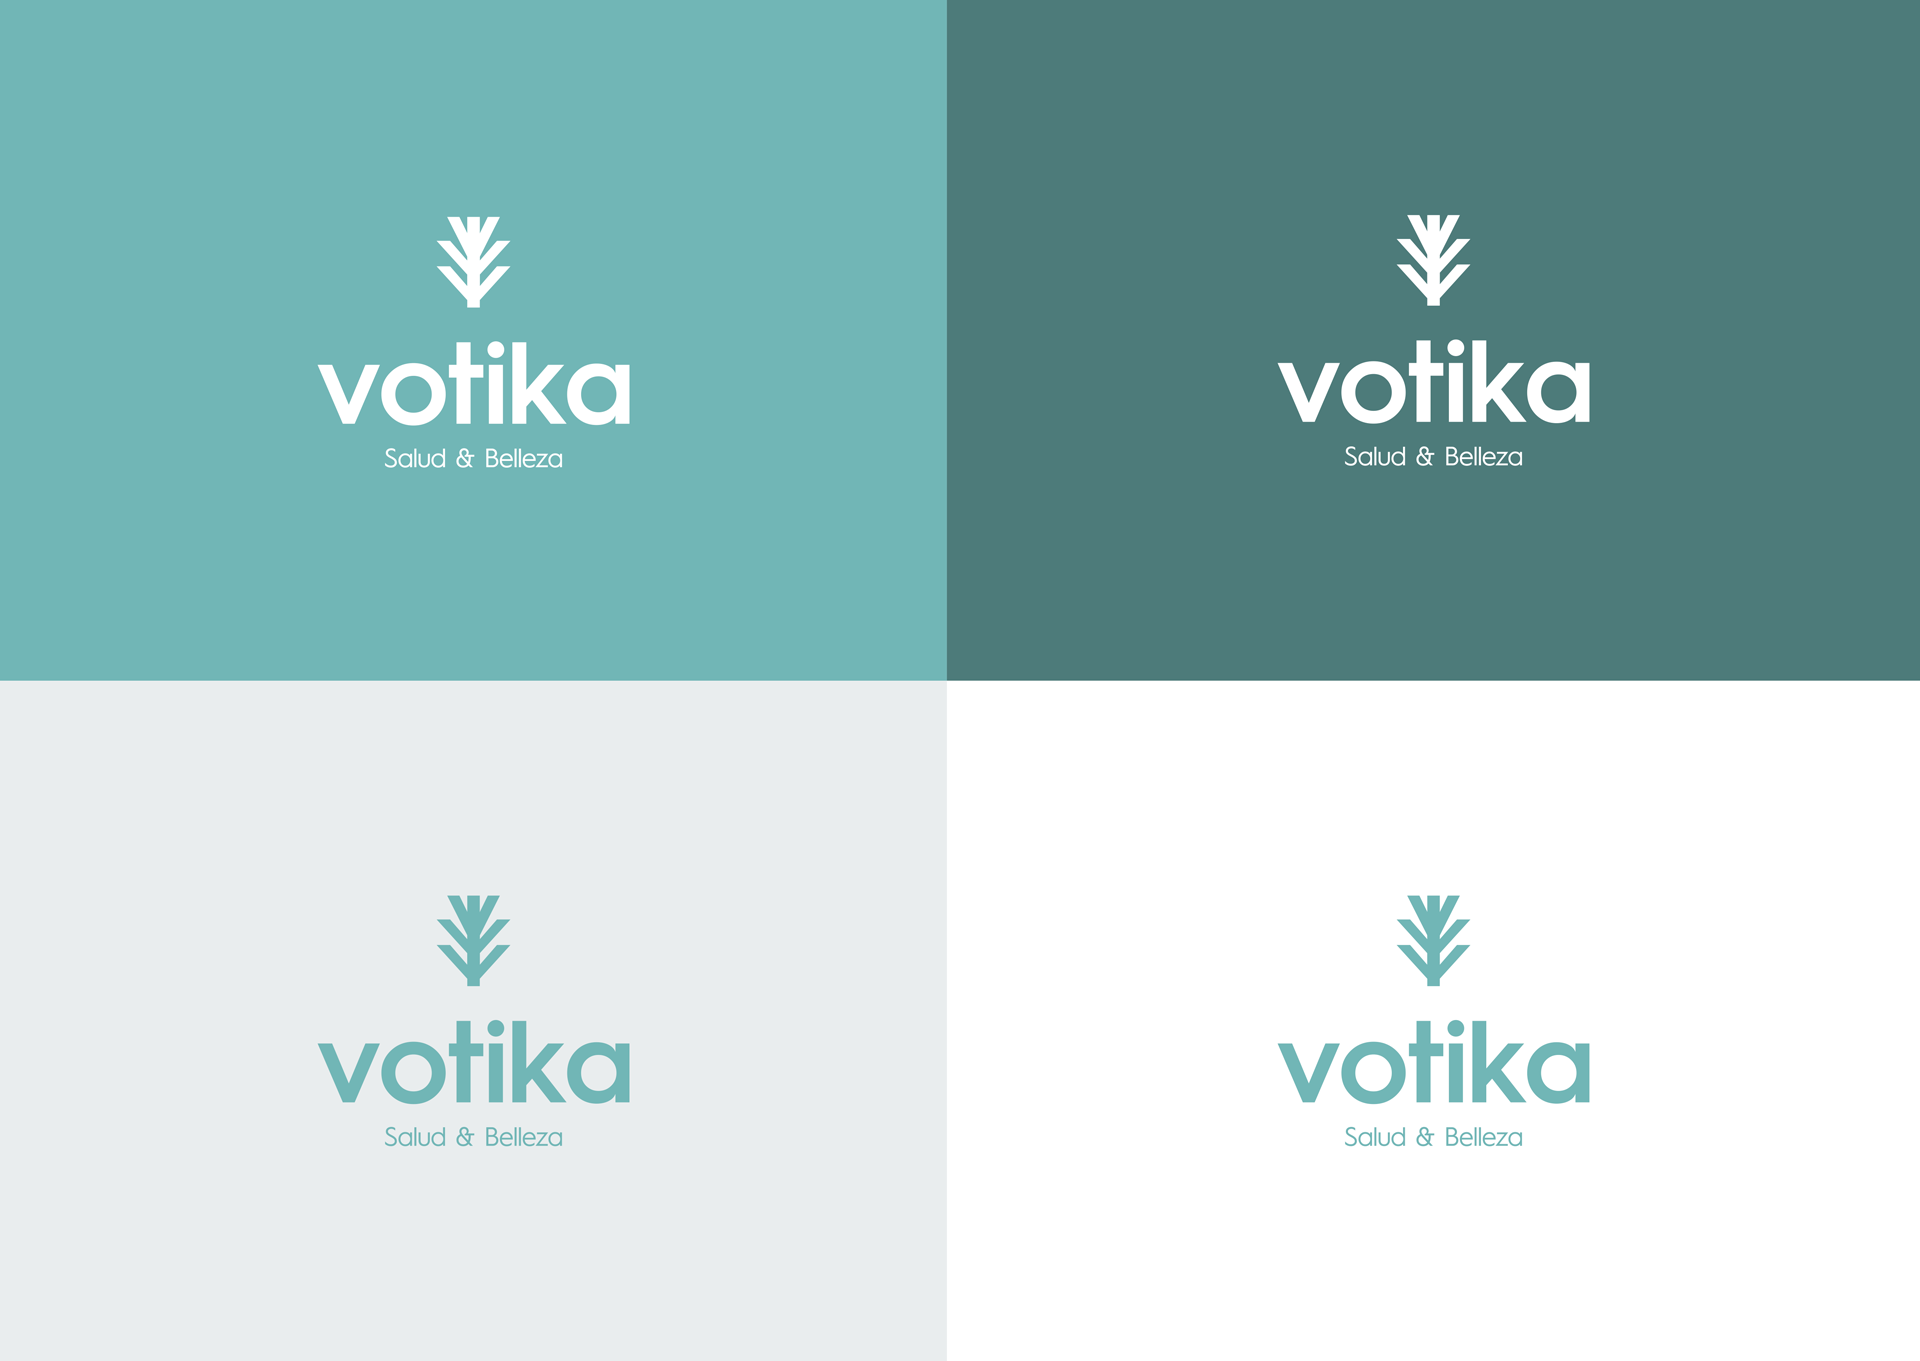 logotipo_color_votika